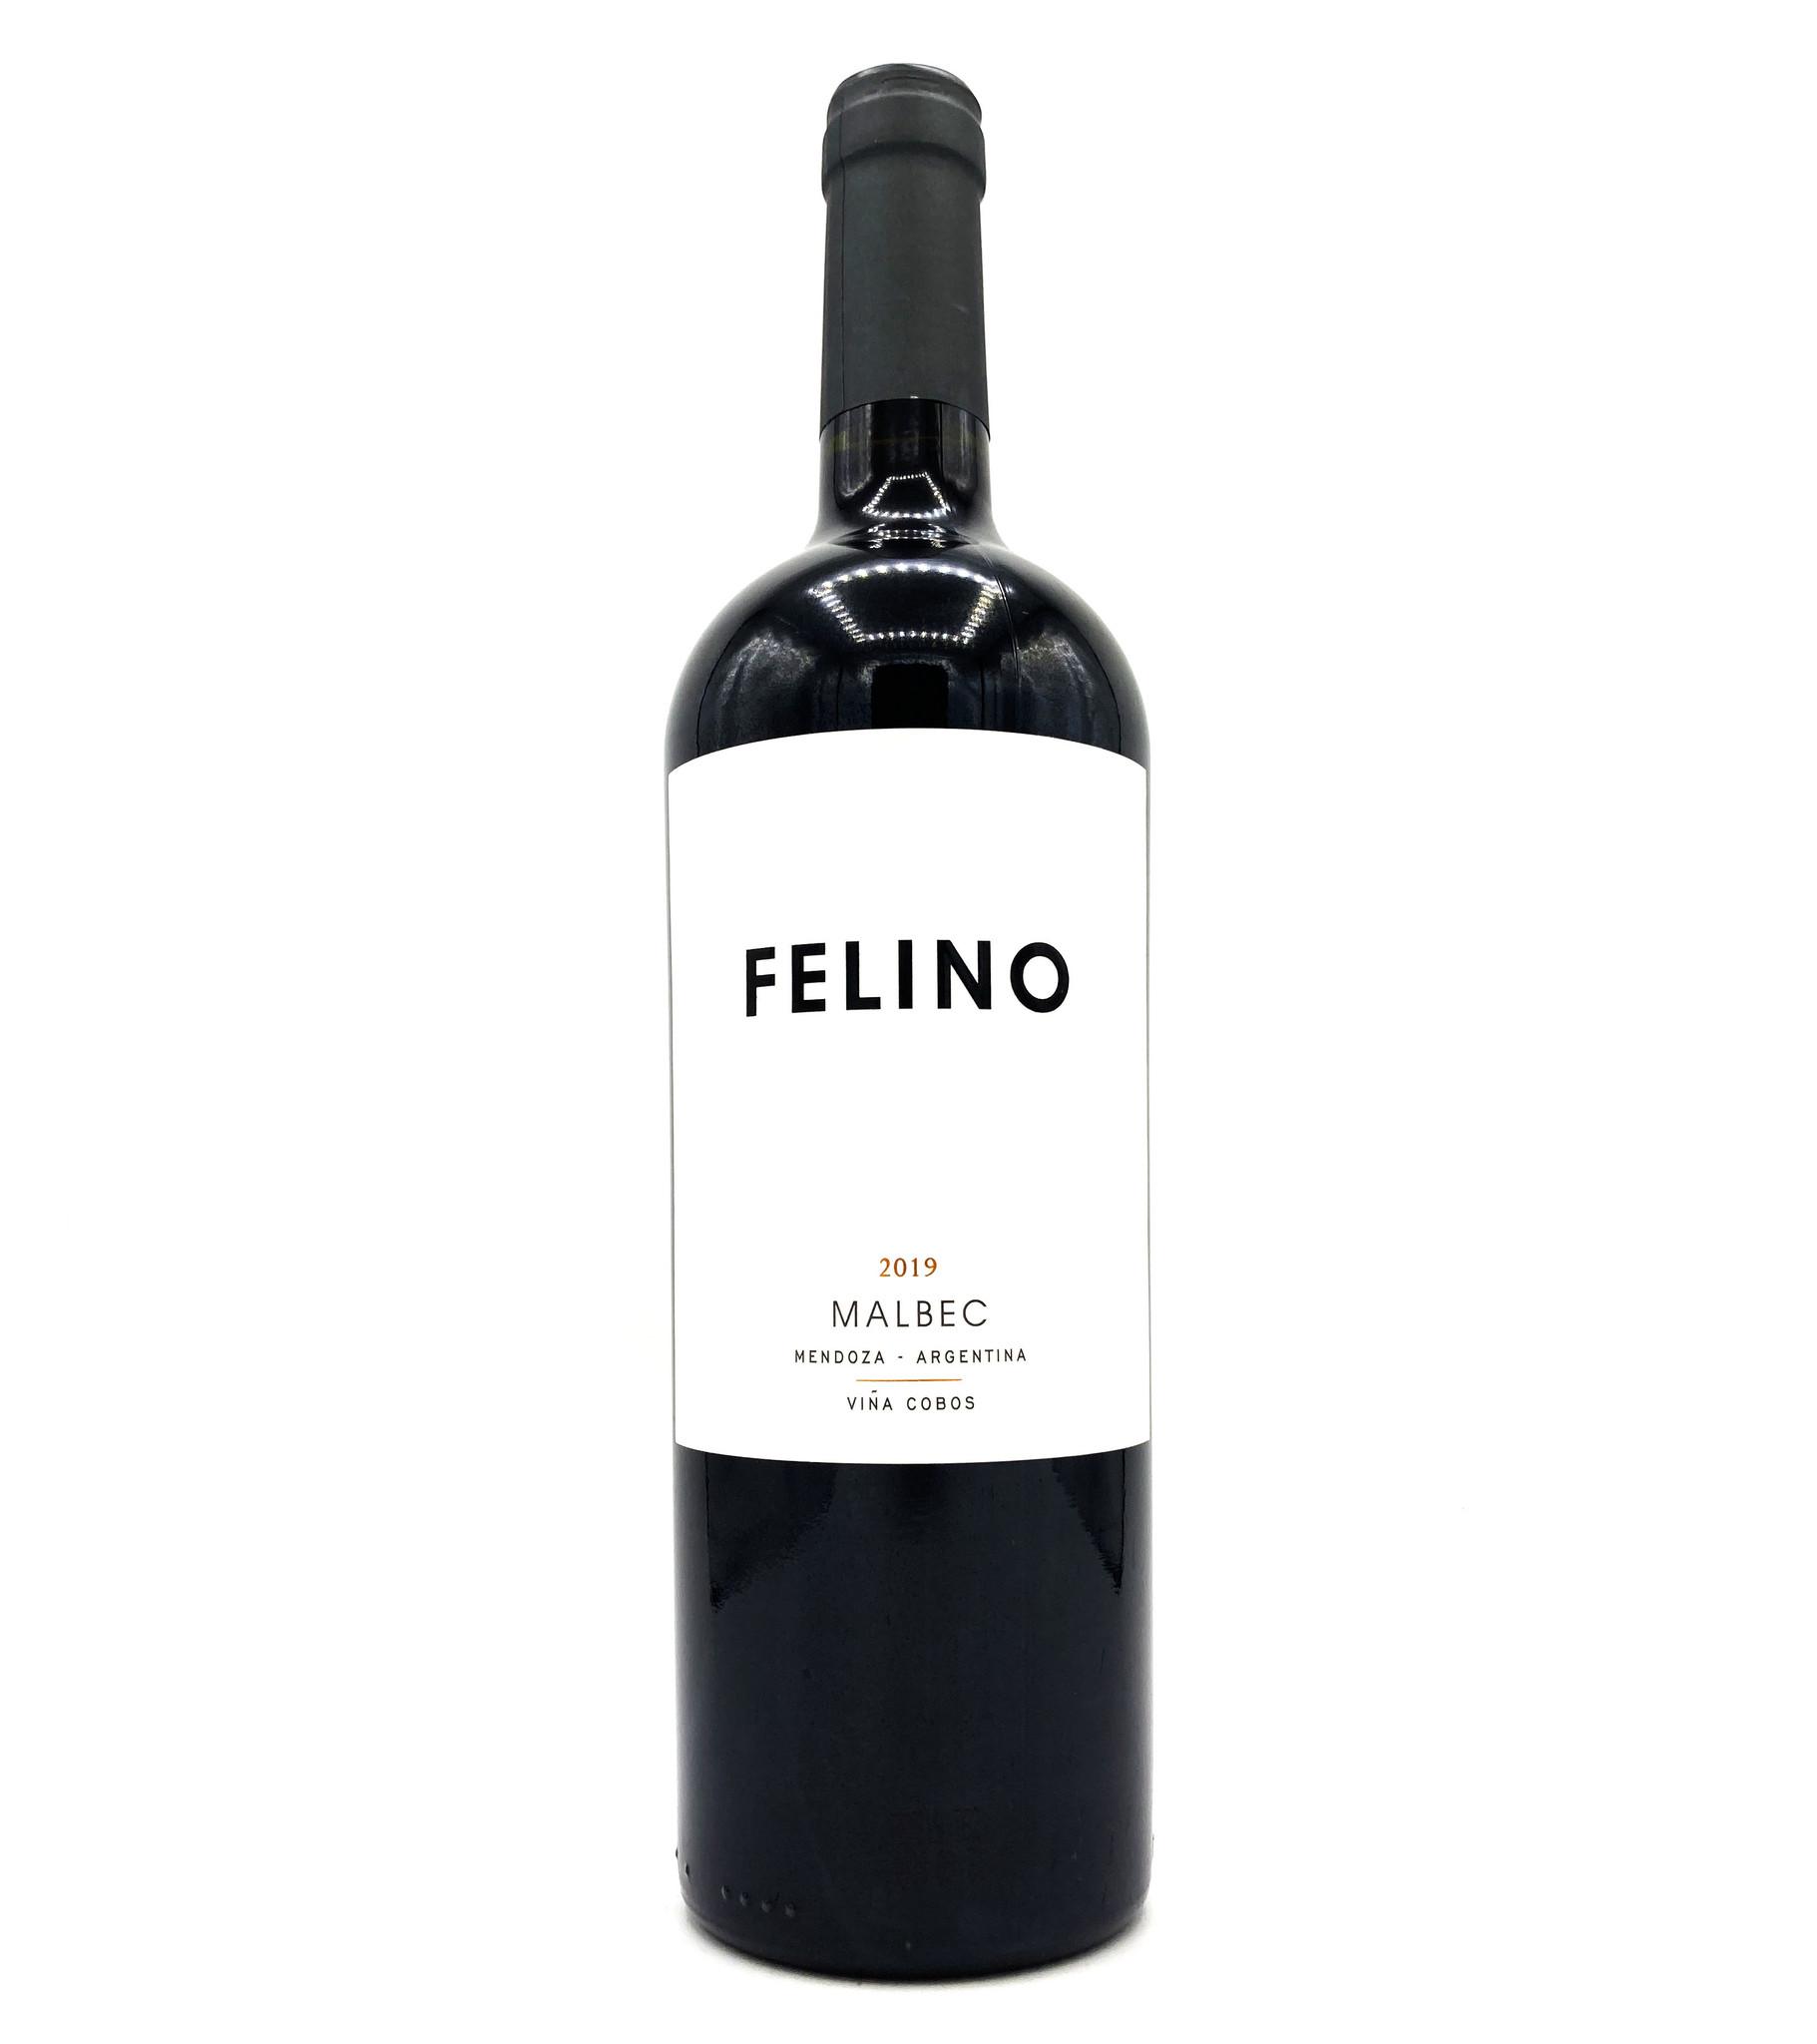 Malbec Felino 2019 Vina Cobos